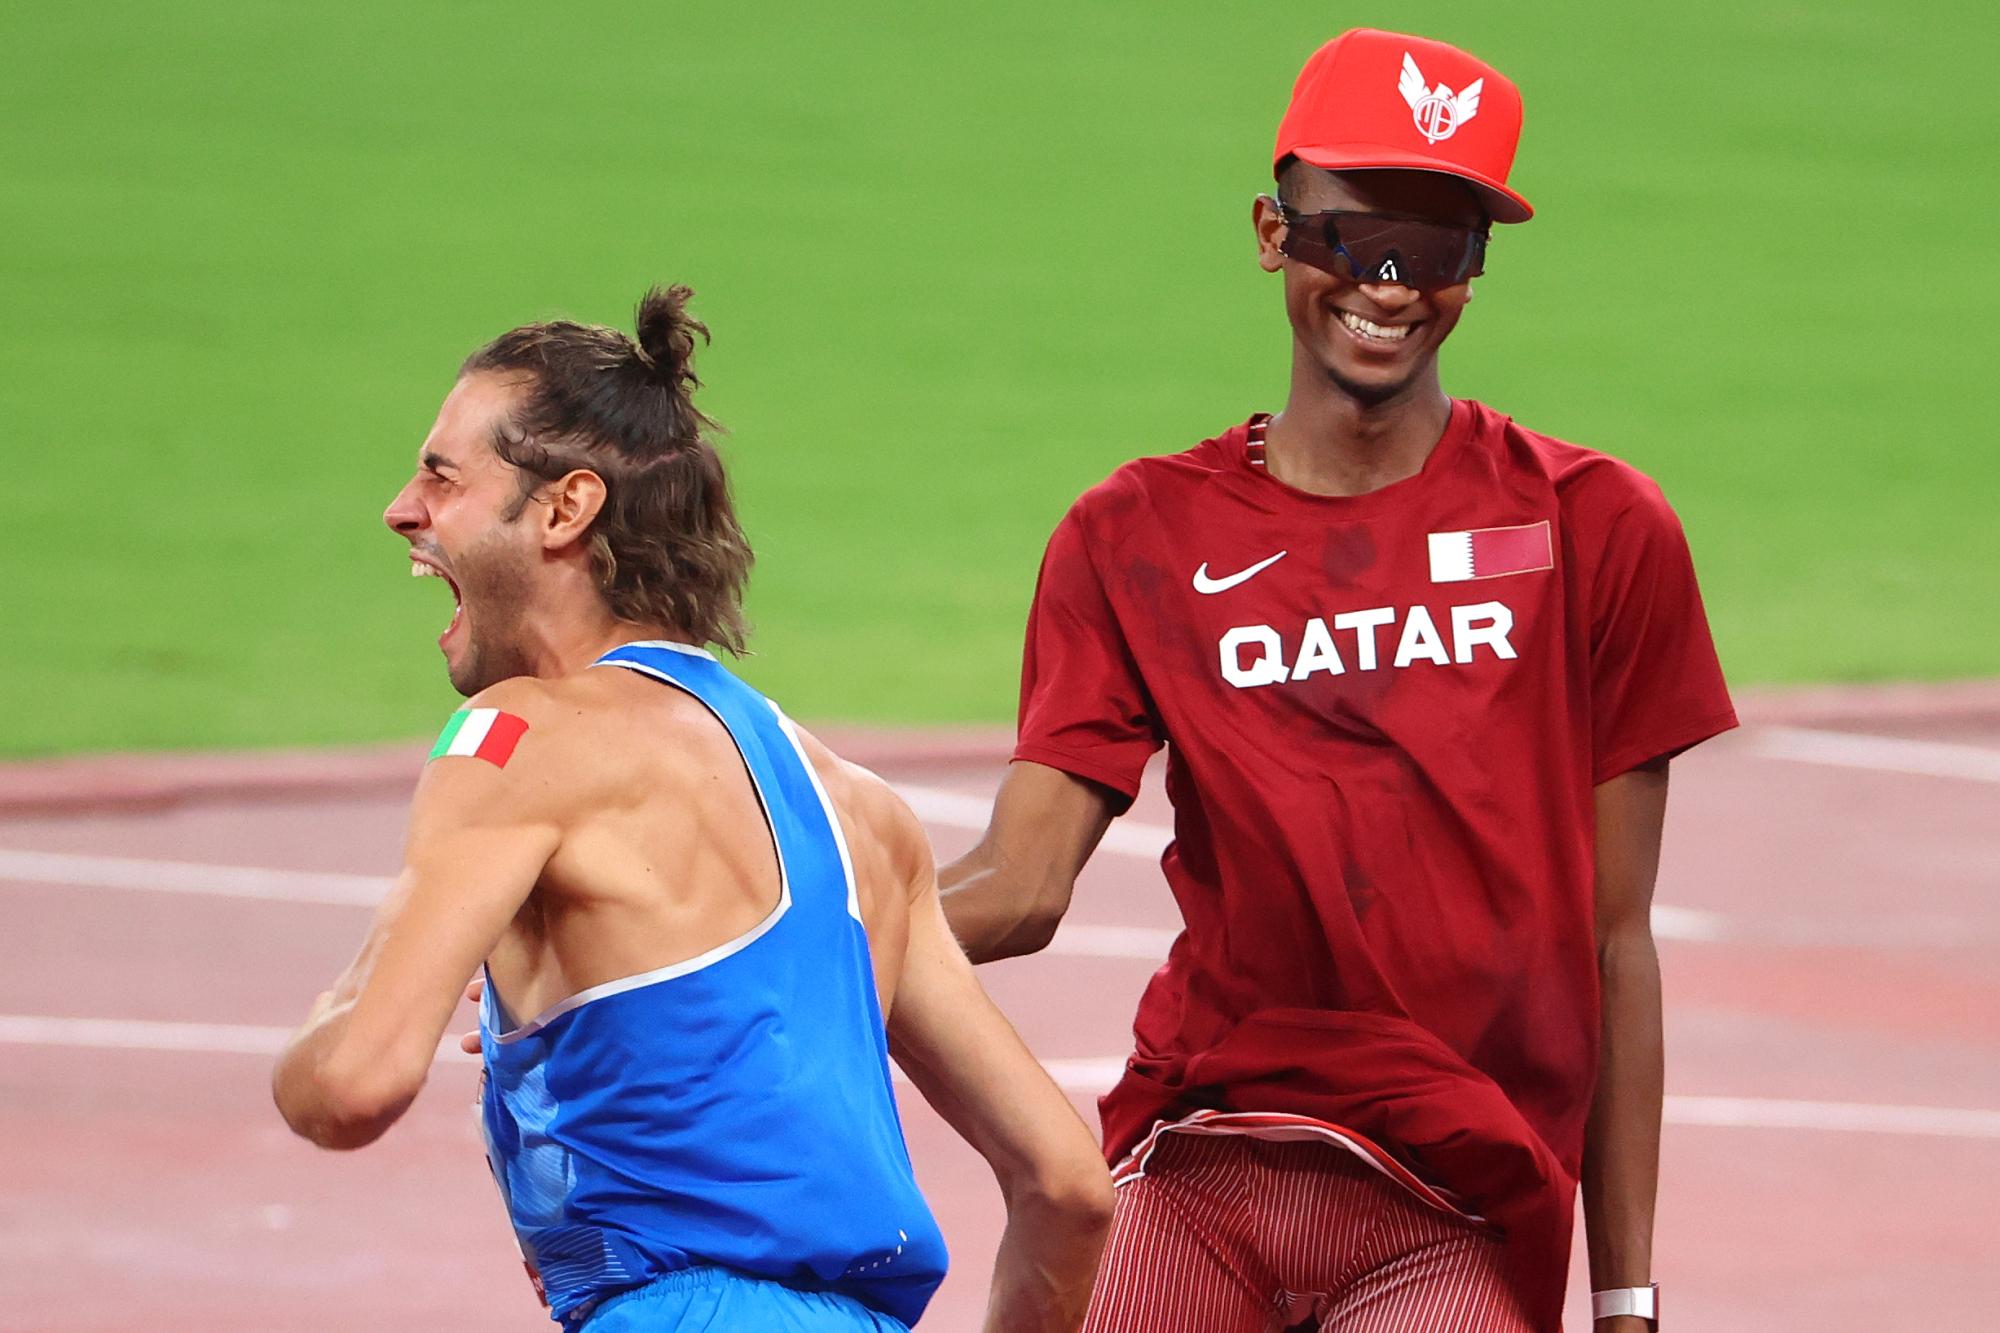 italiano catariano dividem dividir medalha ouro salto altura